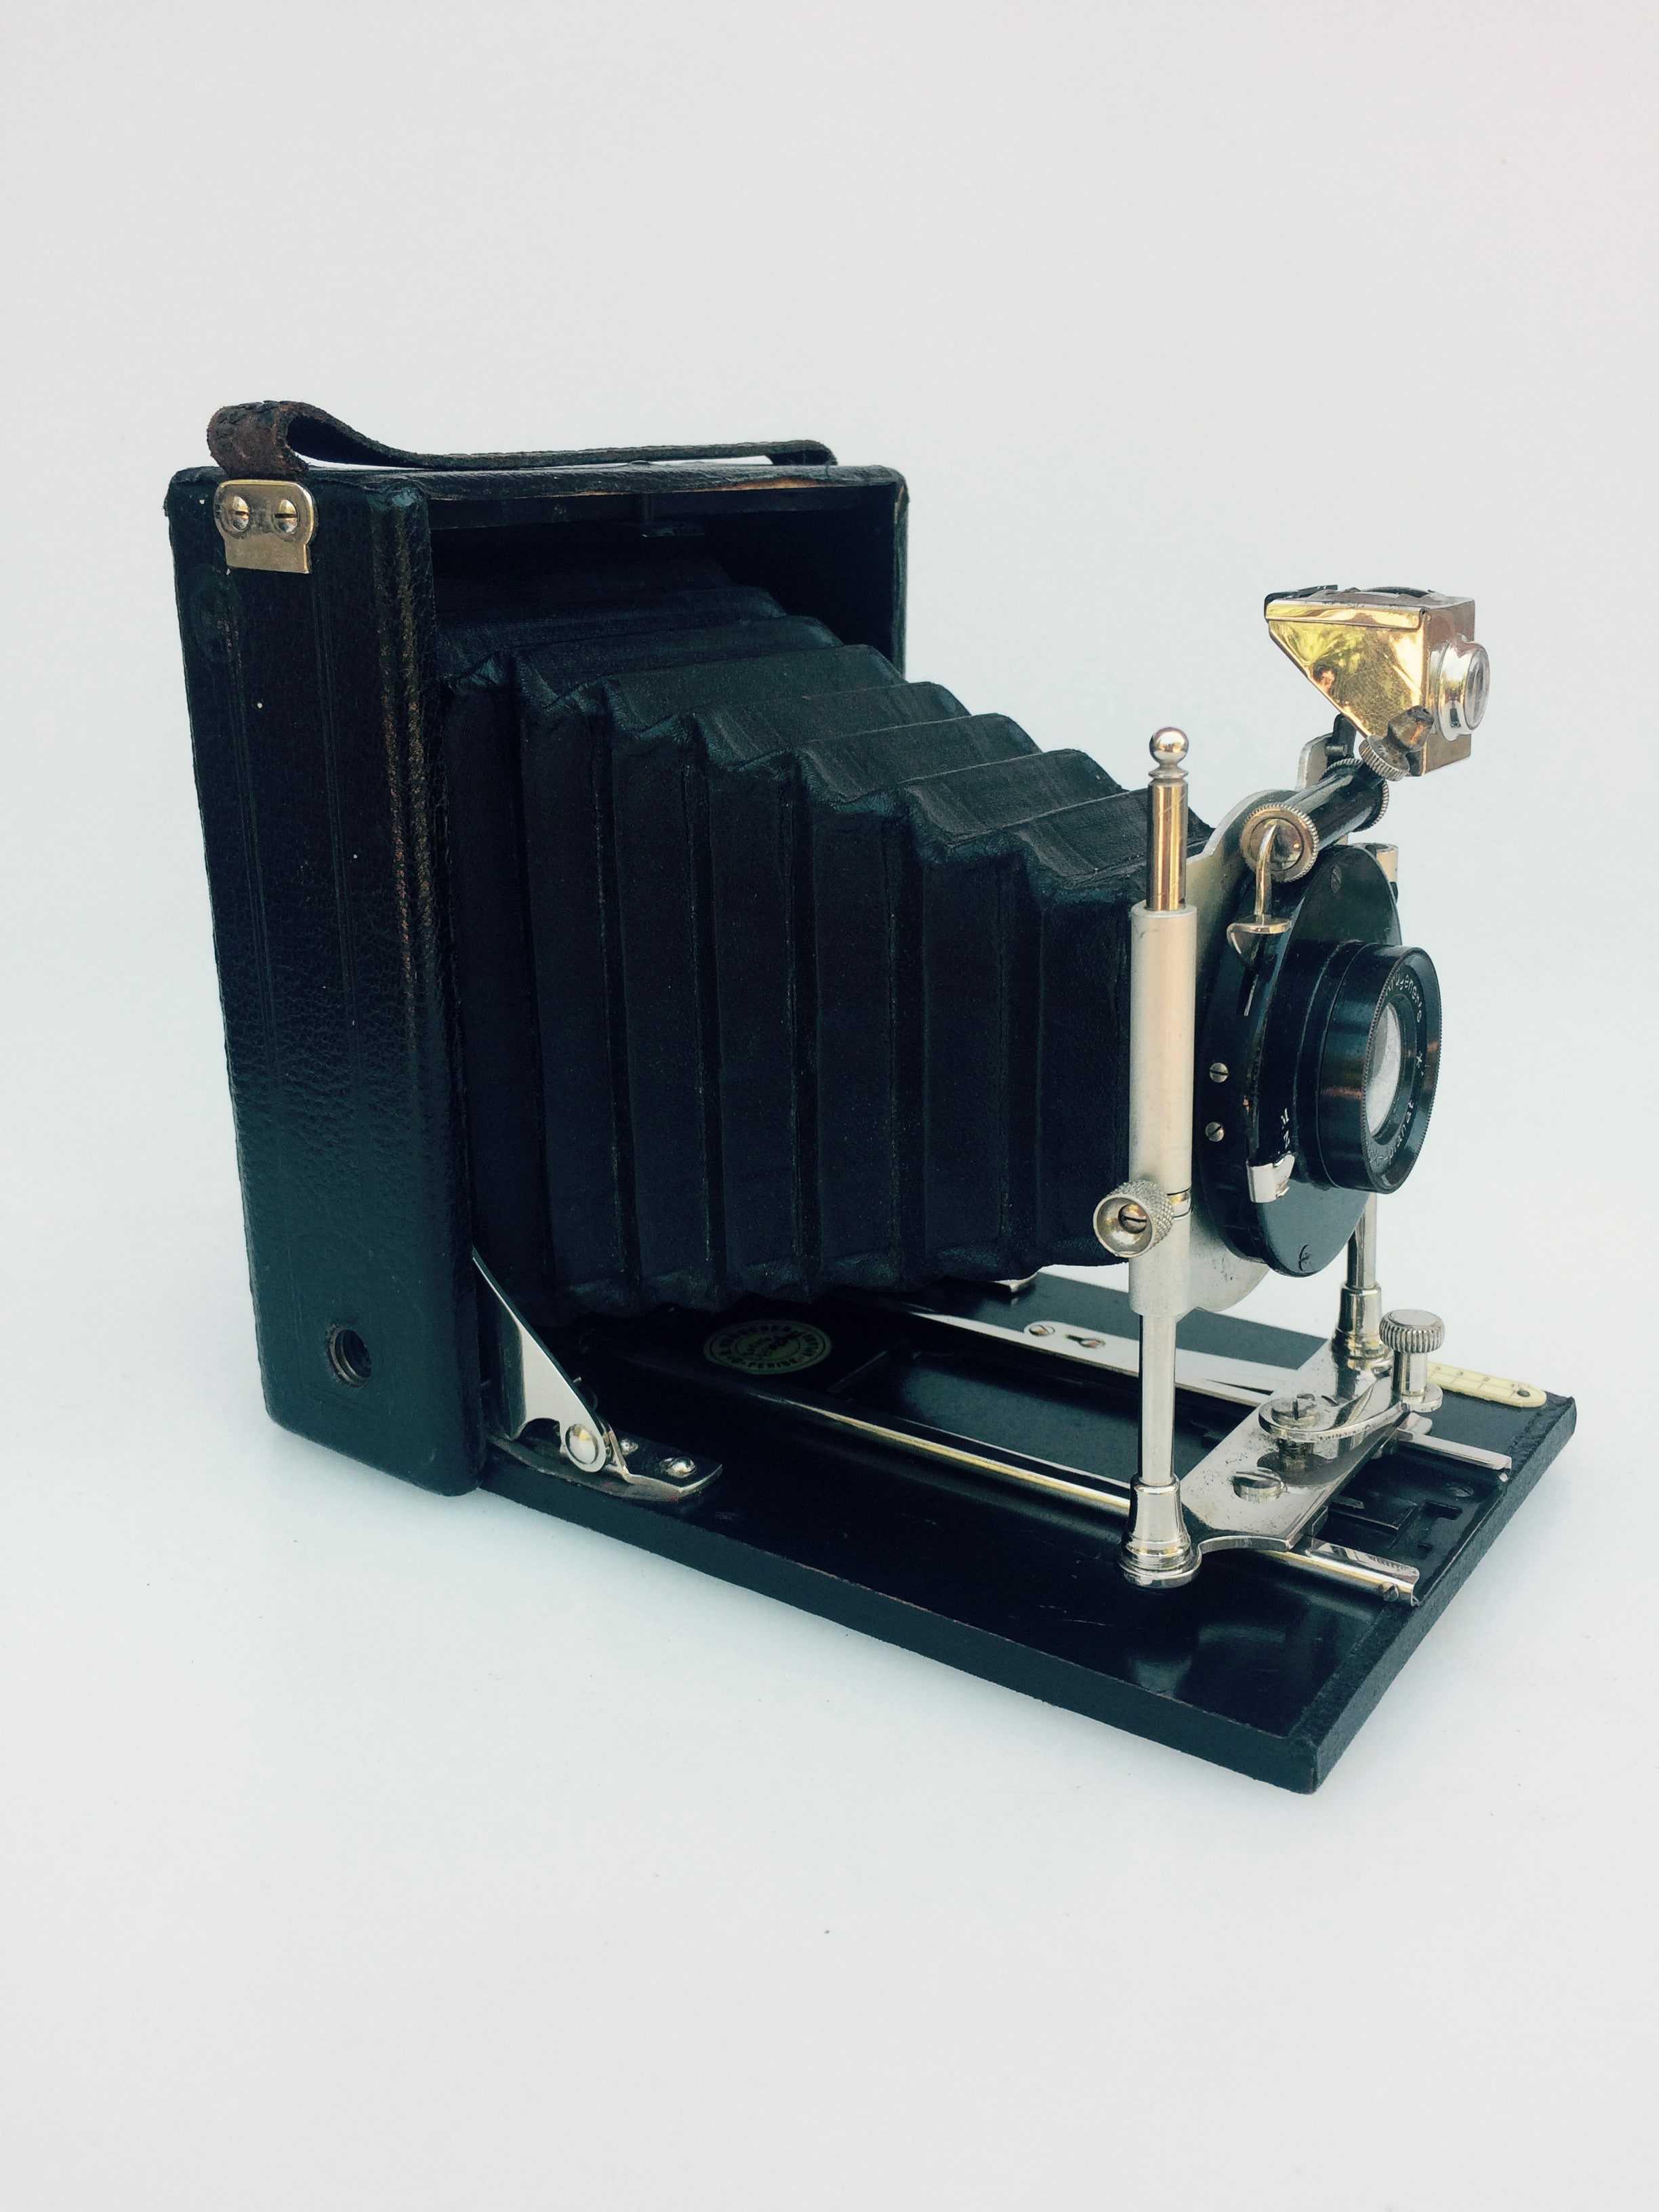 appareil photo soufflet dr r krugener 39 s avec 6 portes plaques. Black Bedroom Furniture Sets. Home Design Ideas